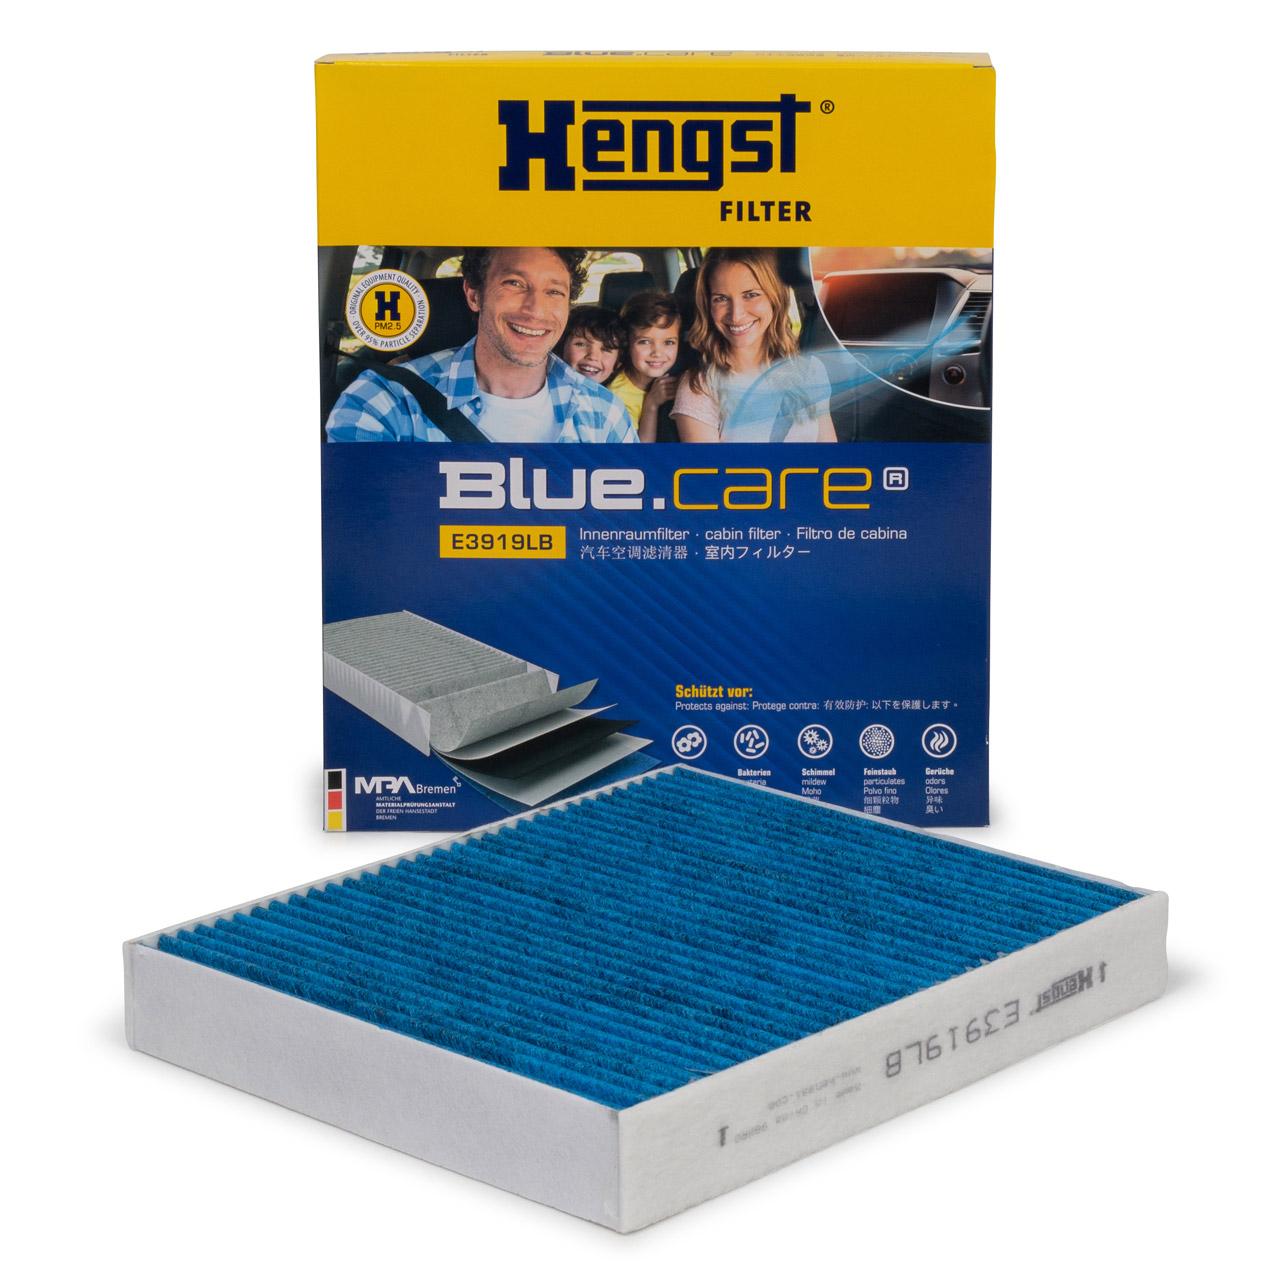 HENGST E3919LB BLUE CARE Innenraumfilter ANTIBAKTERIELL für AUDI SEAT SKODA POLO